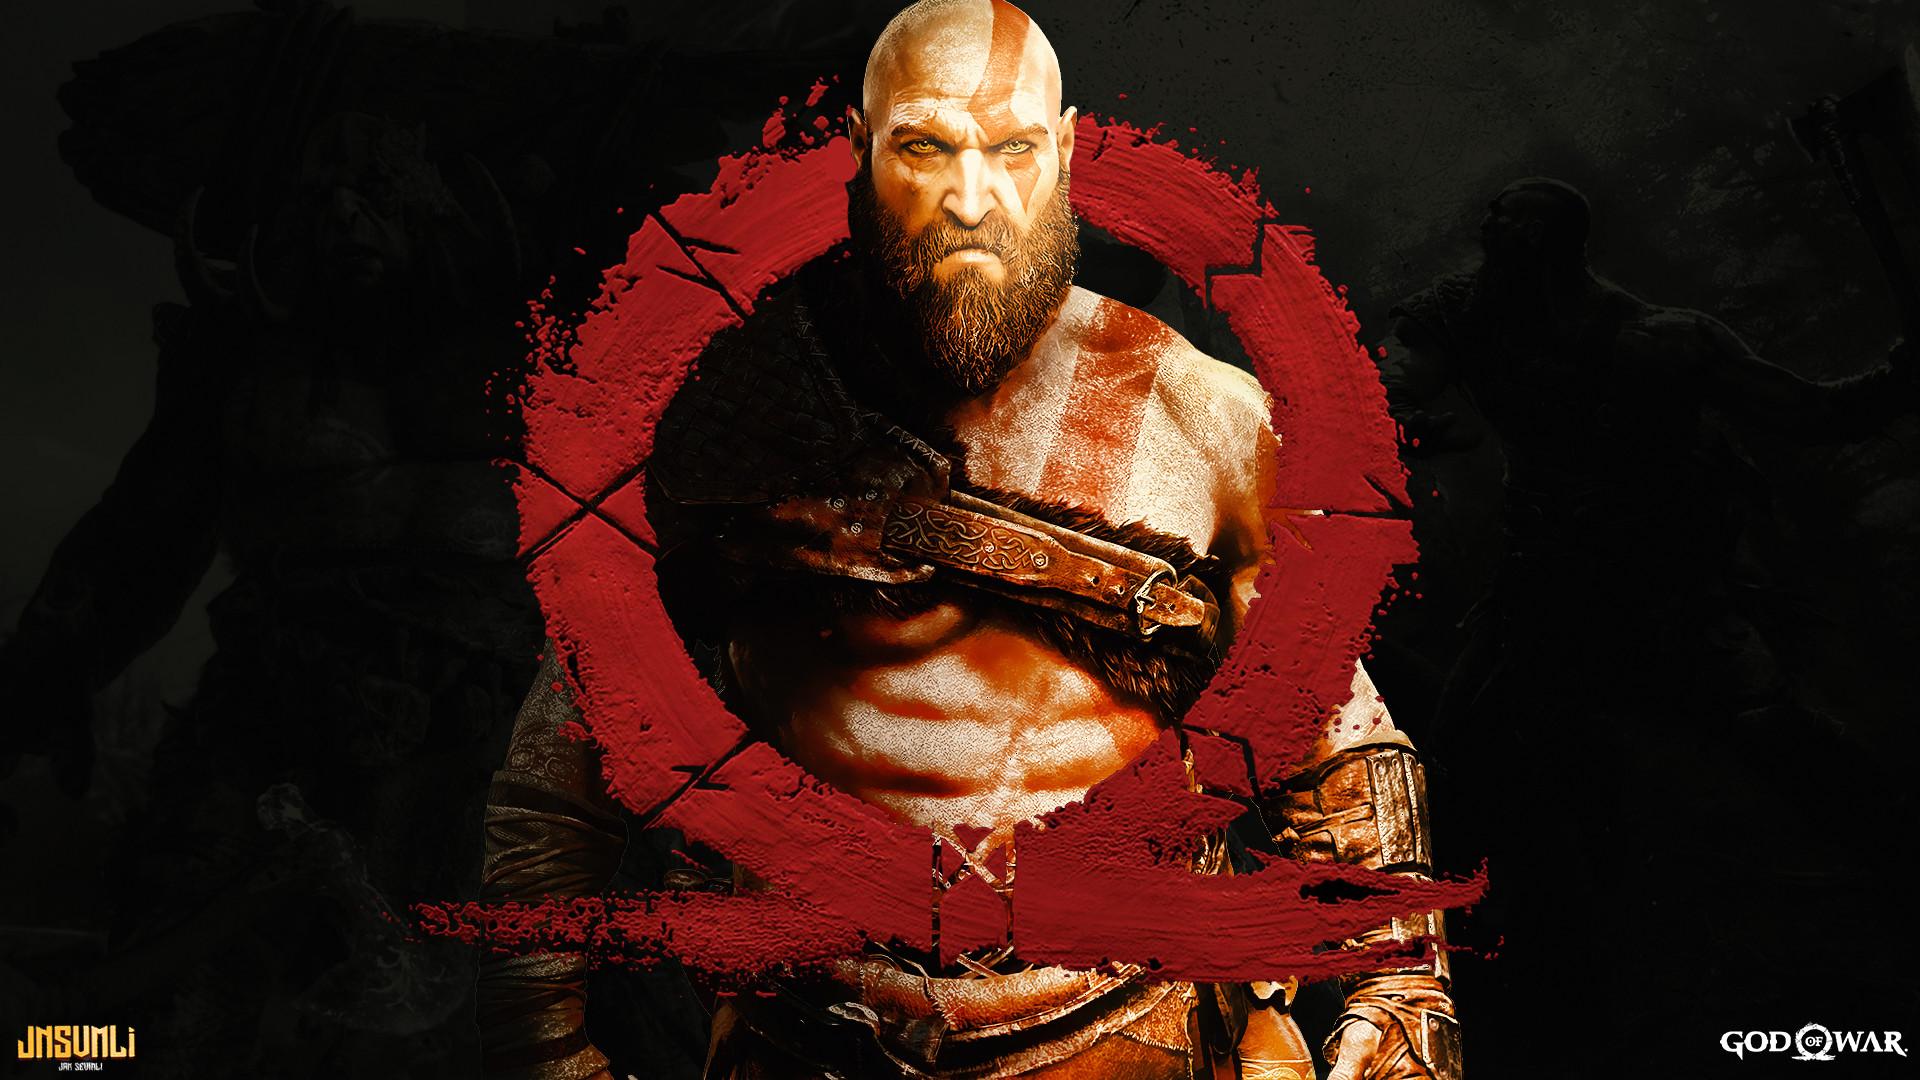 god of war hd wallpapers